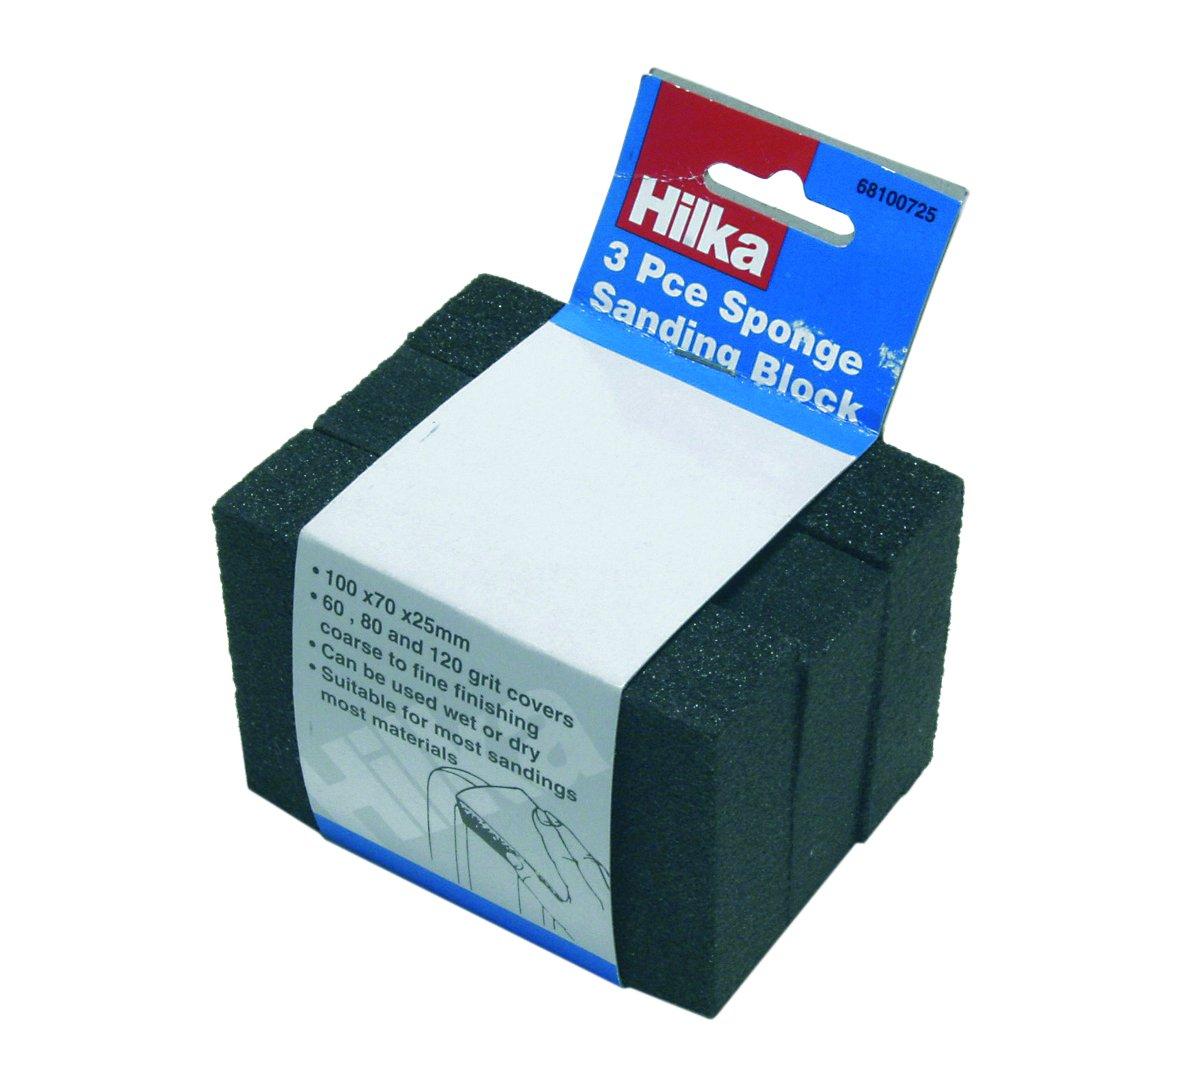 Hilka 68100725 Sponge Sanding Block Set Hilka Tools (UK) Ltd